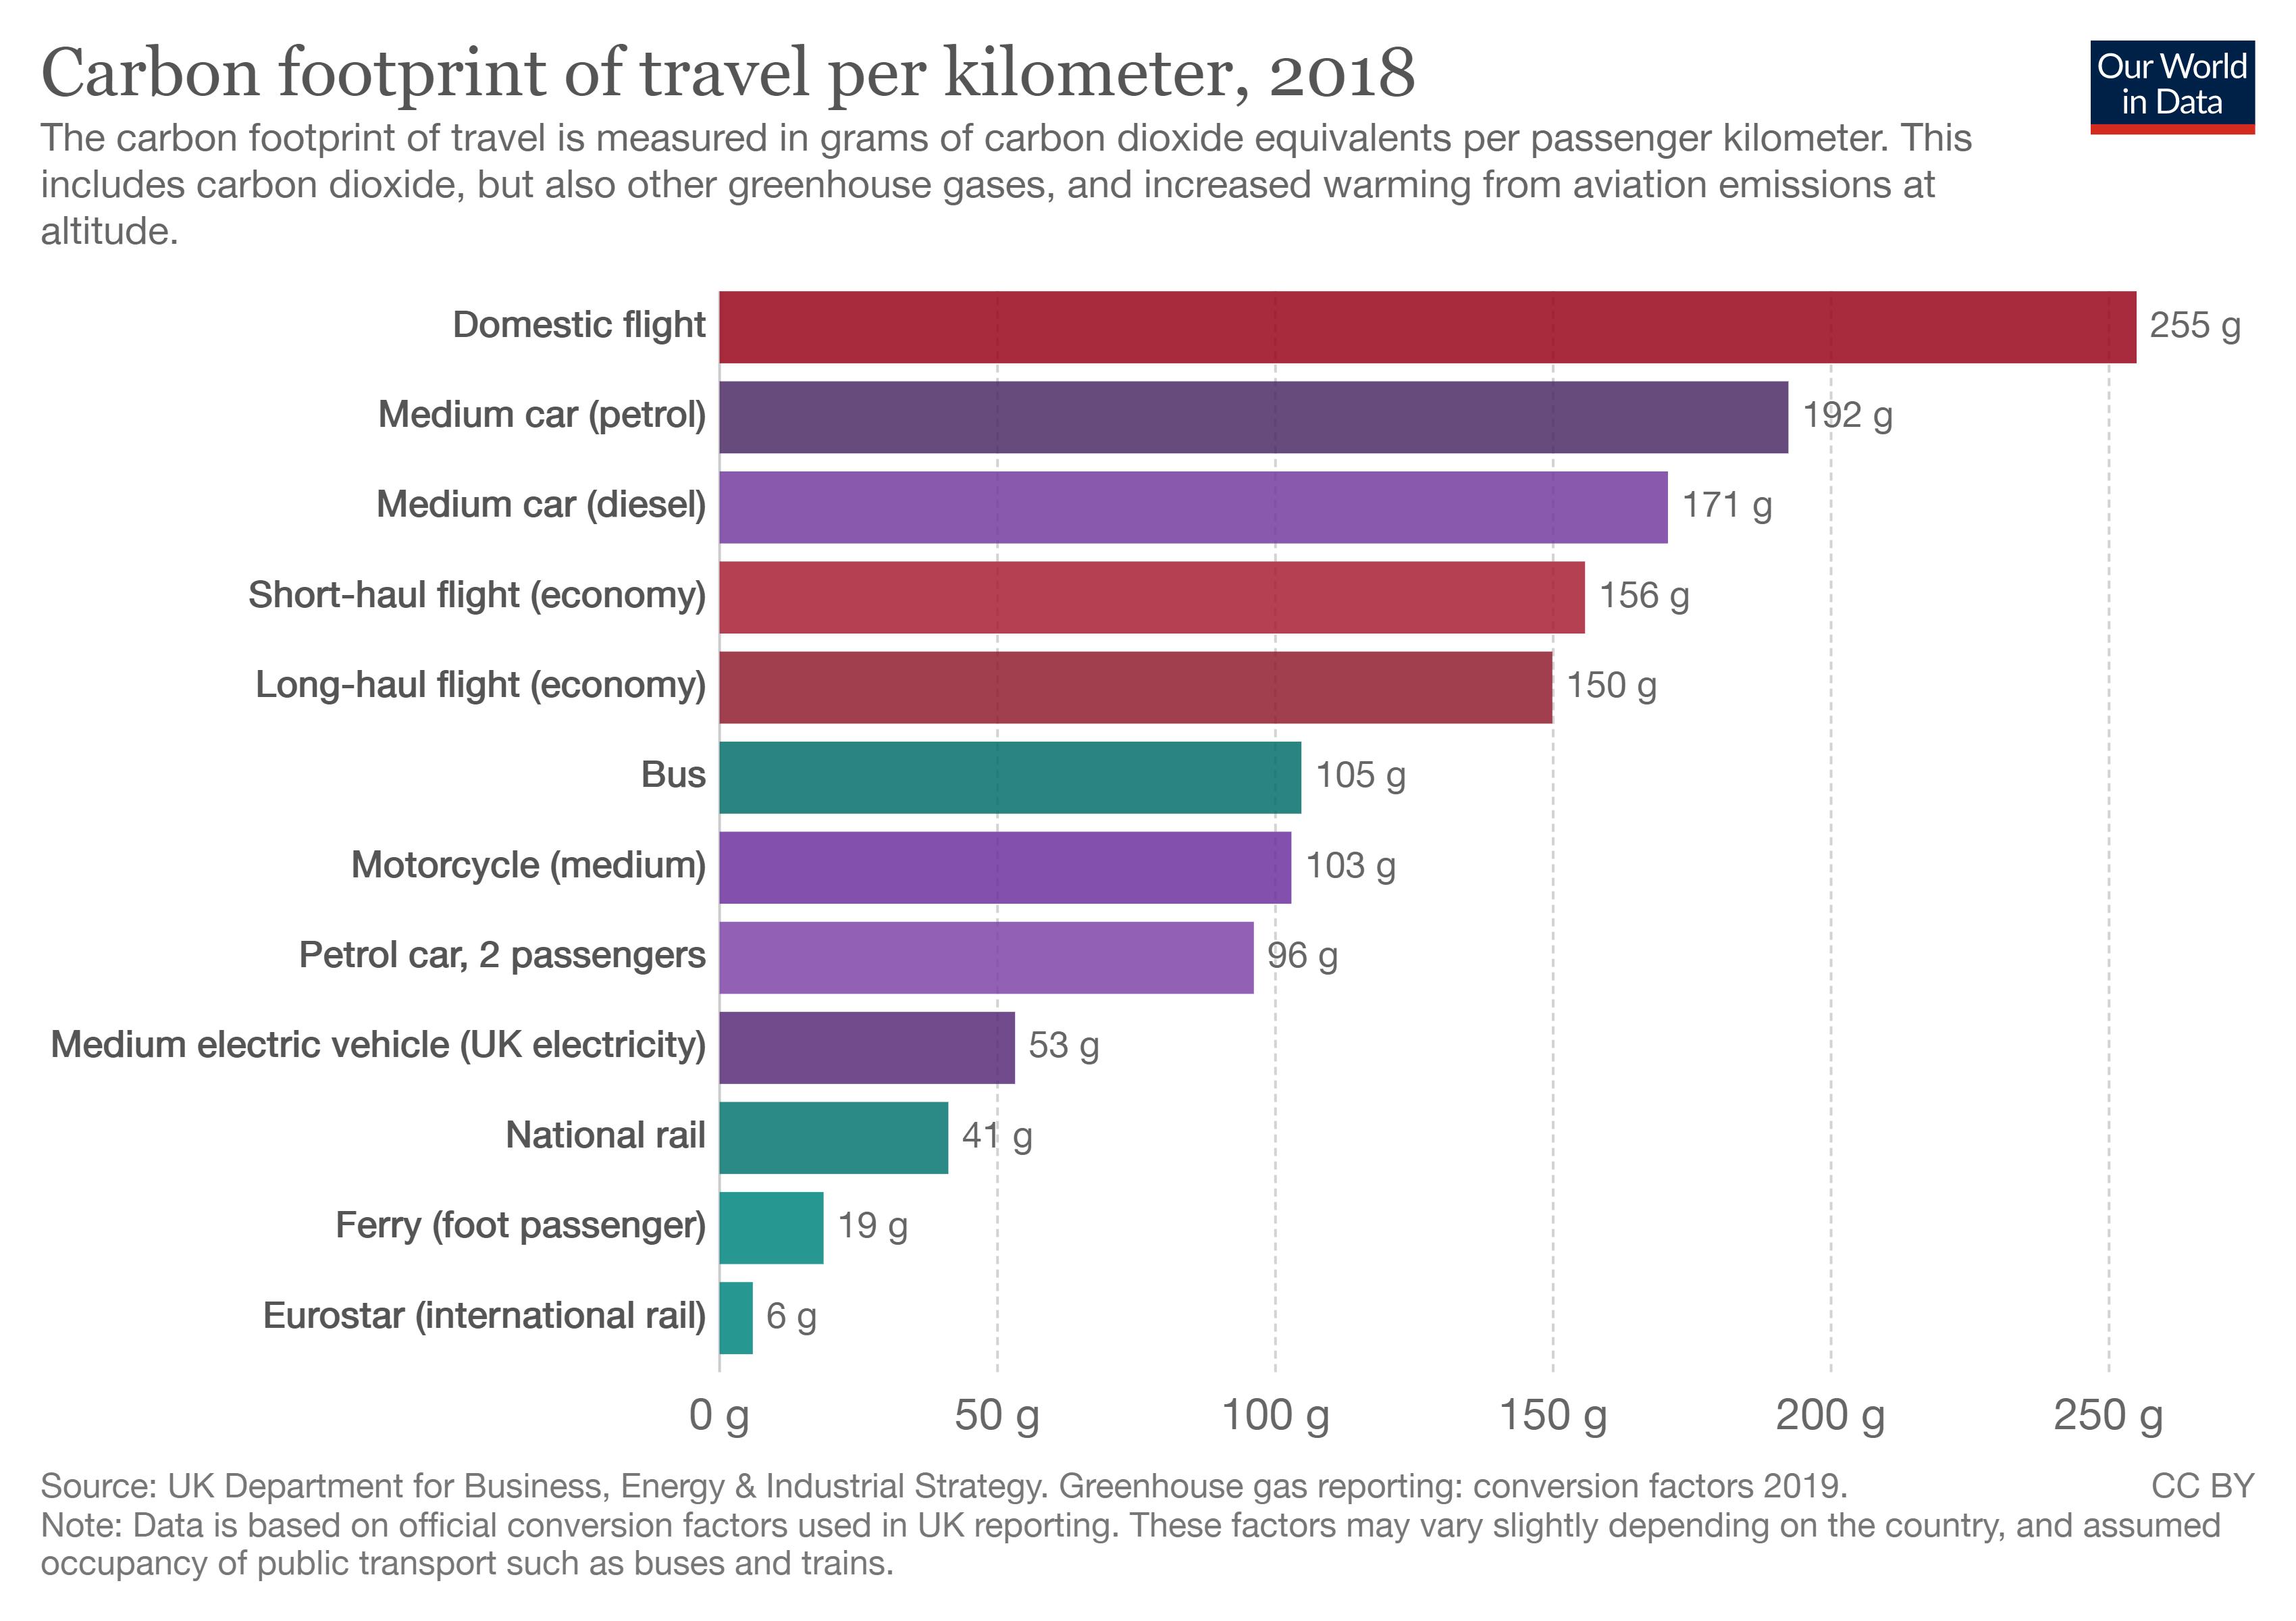 Carbon footprint of travel per kilometer, 2018.